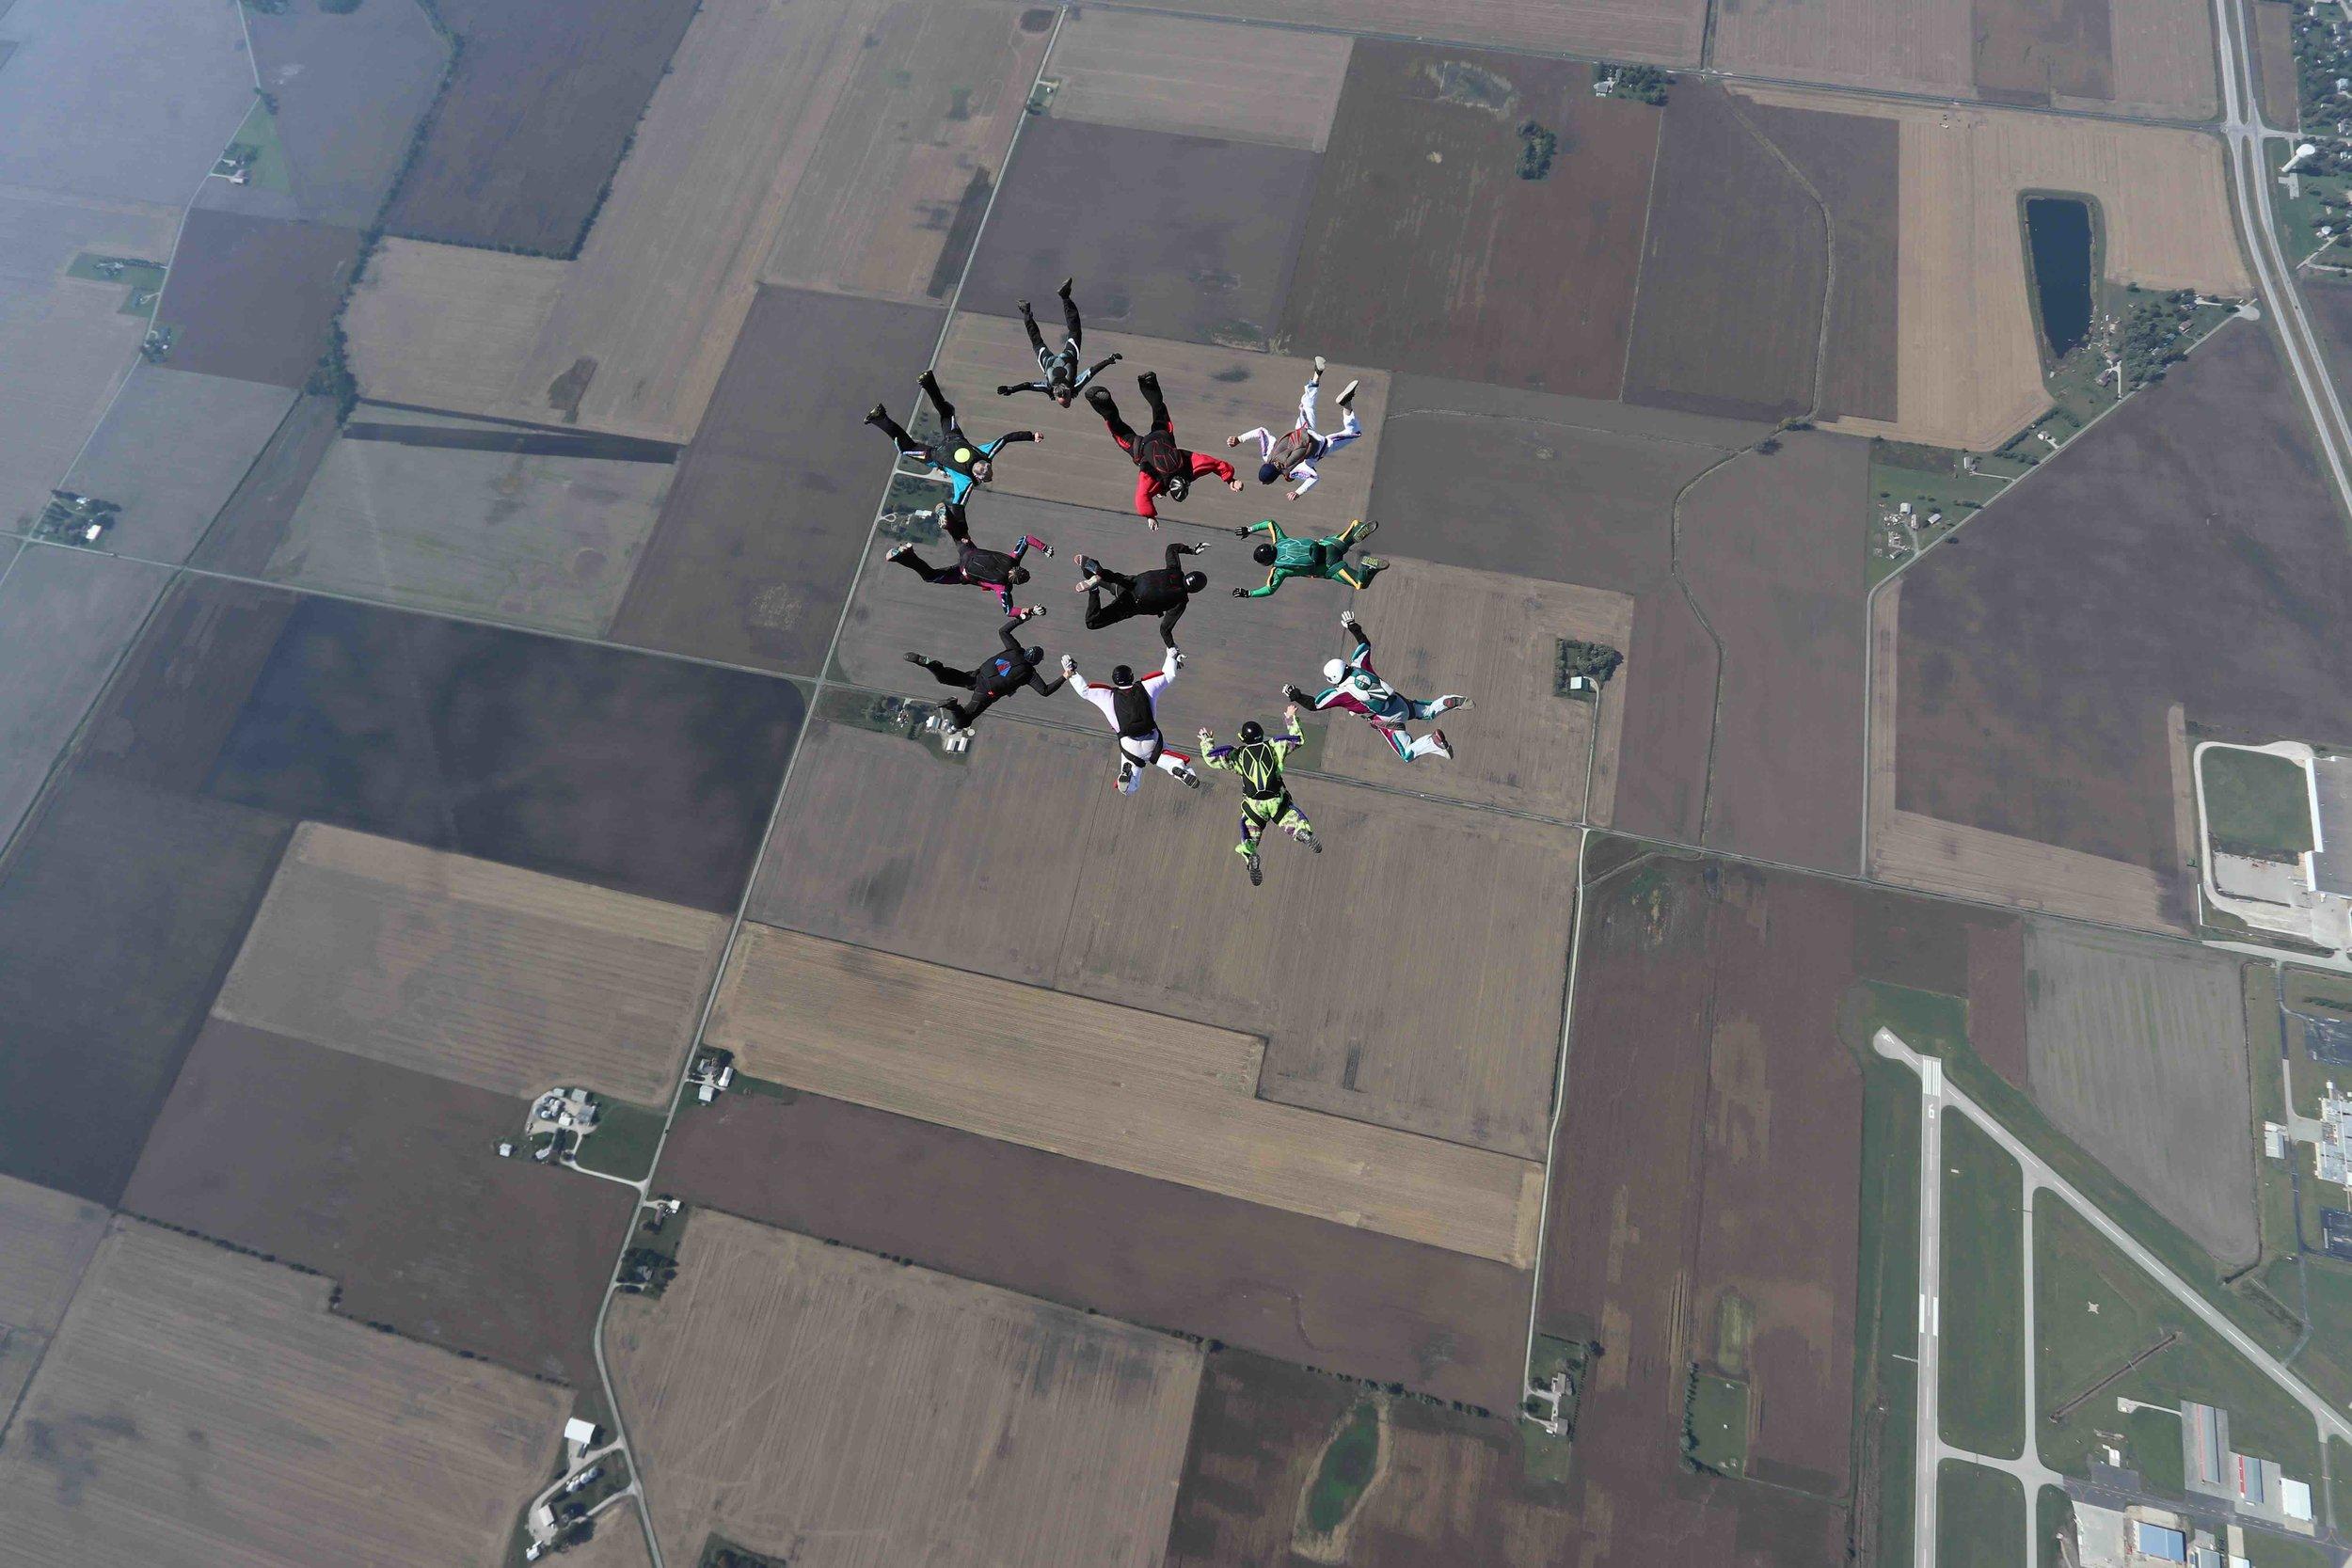 Skydive record at Skydive Indianapolis